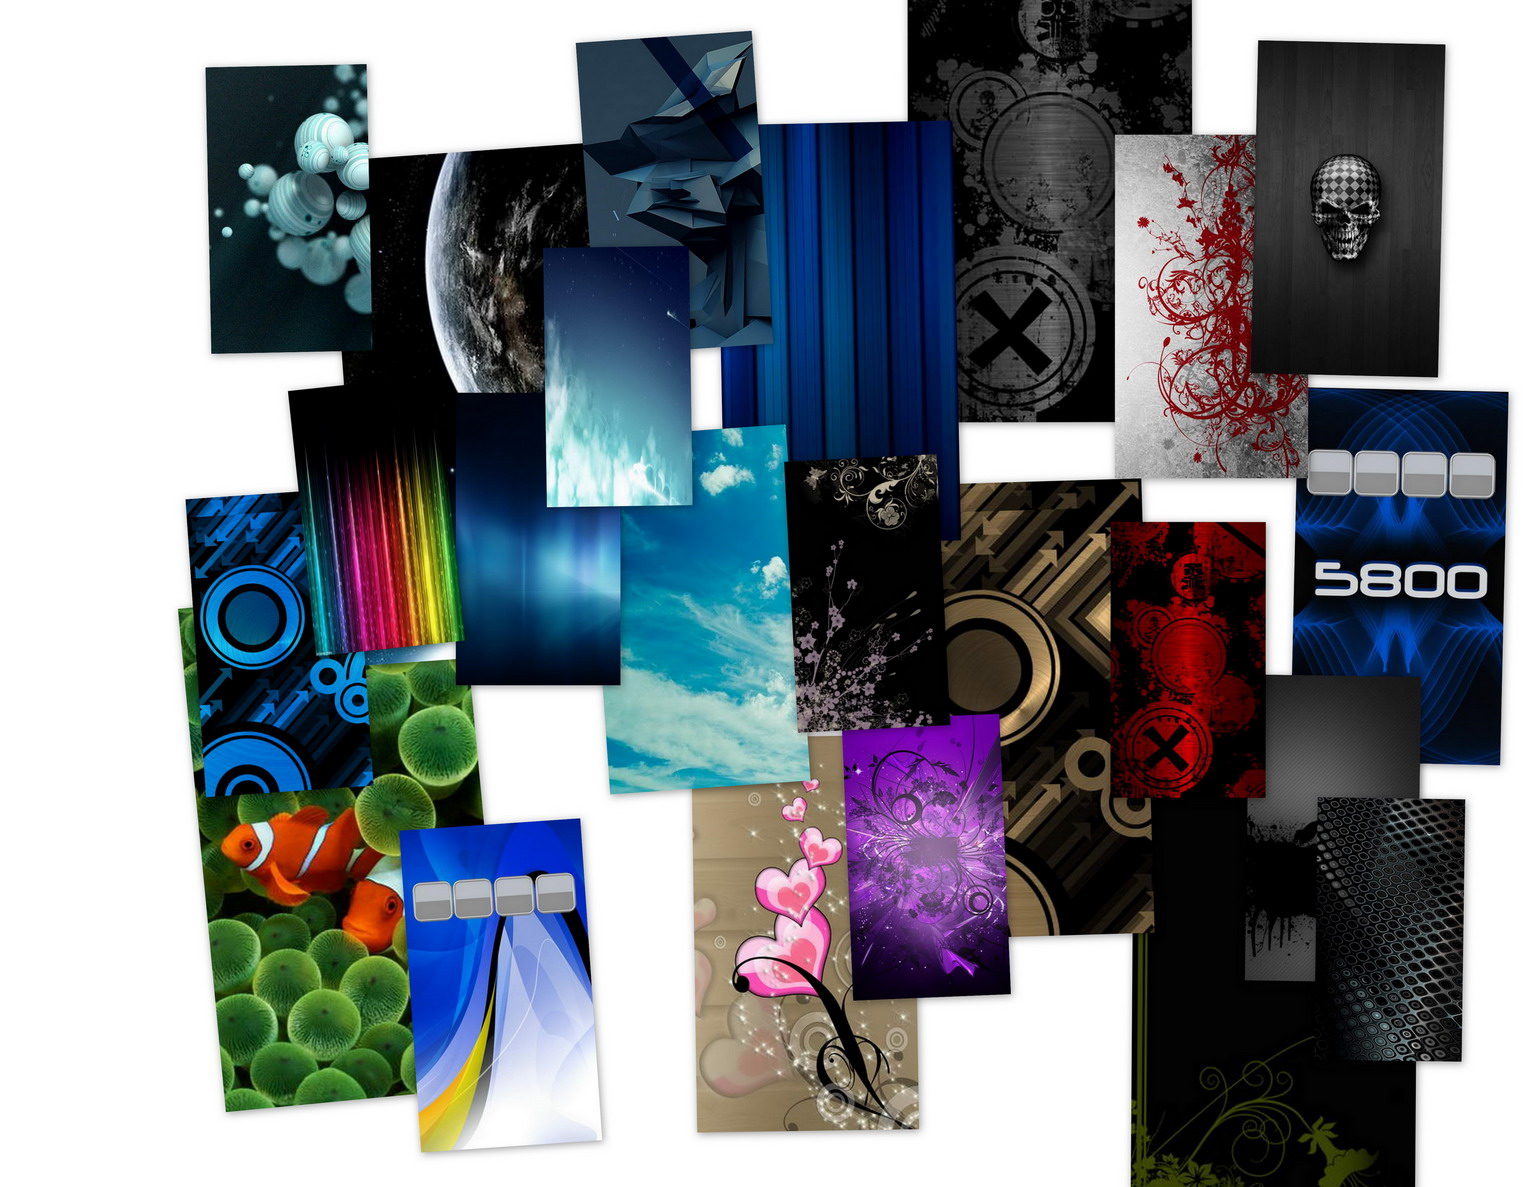 http://4.bp.blogspot.com/-bUlQCzjc9qo/TcnfjtTOM2I/AAAAAAAABbk/y3HRlQl0EQo/s1600/nokia_5800_pack_wallpaper.jpg